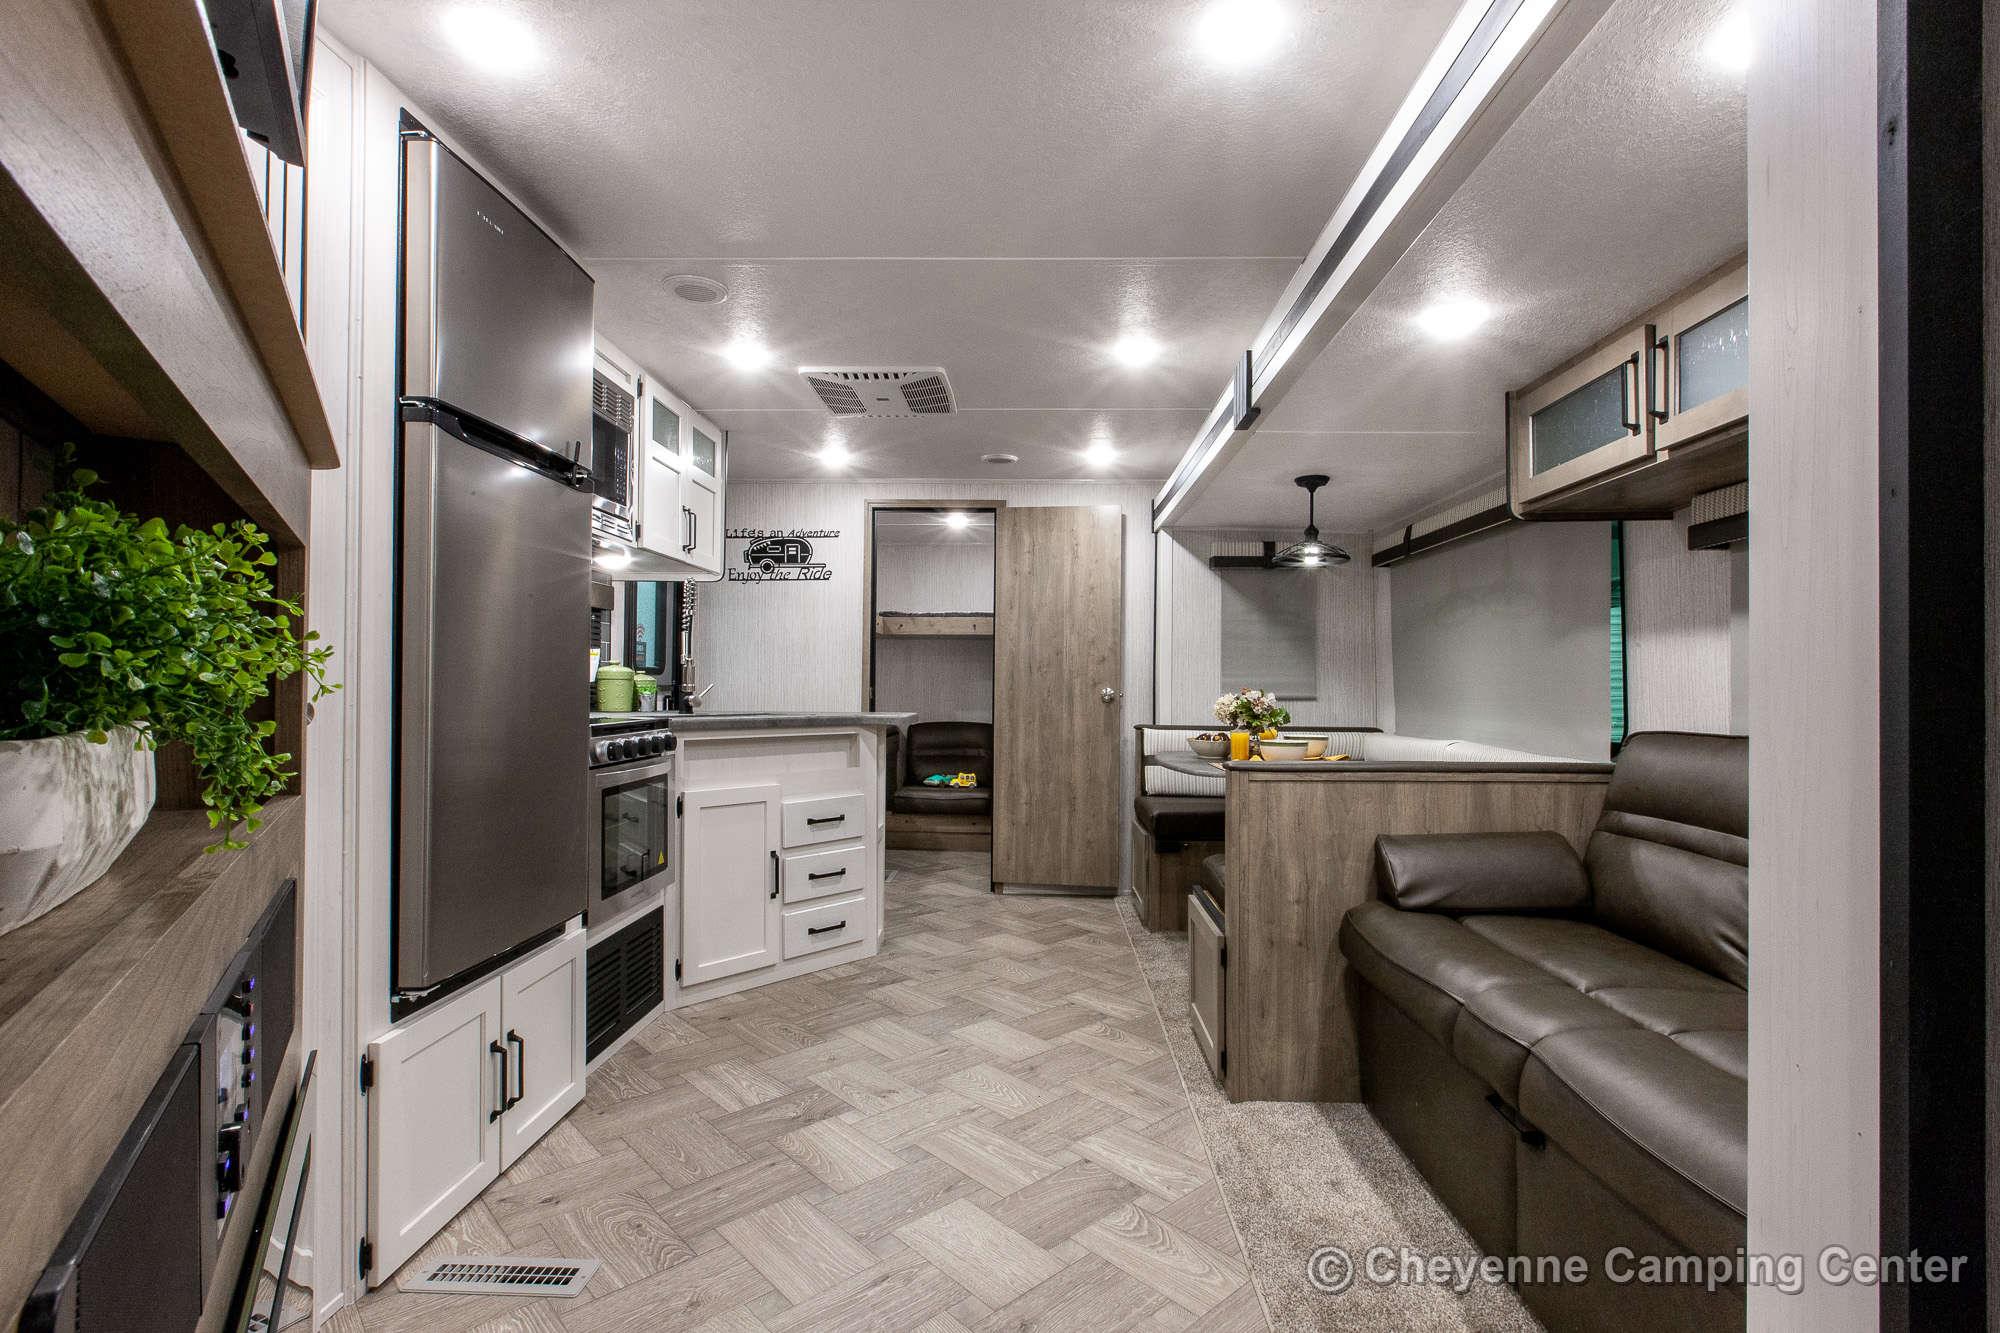 2021 Palomino Puma 28BHSS Bunkhouse Travel Trailer Interior Image